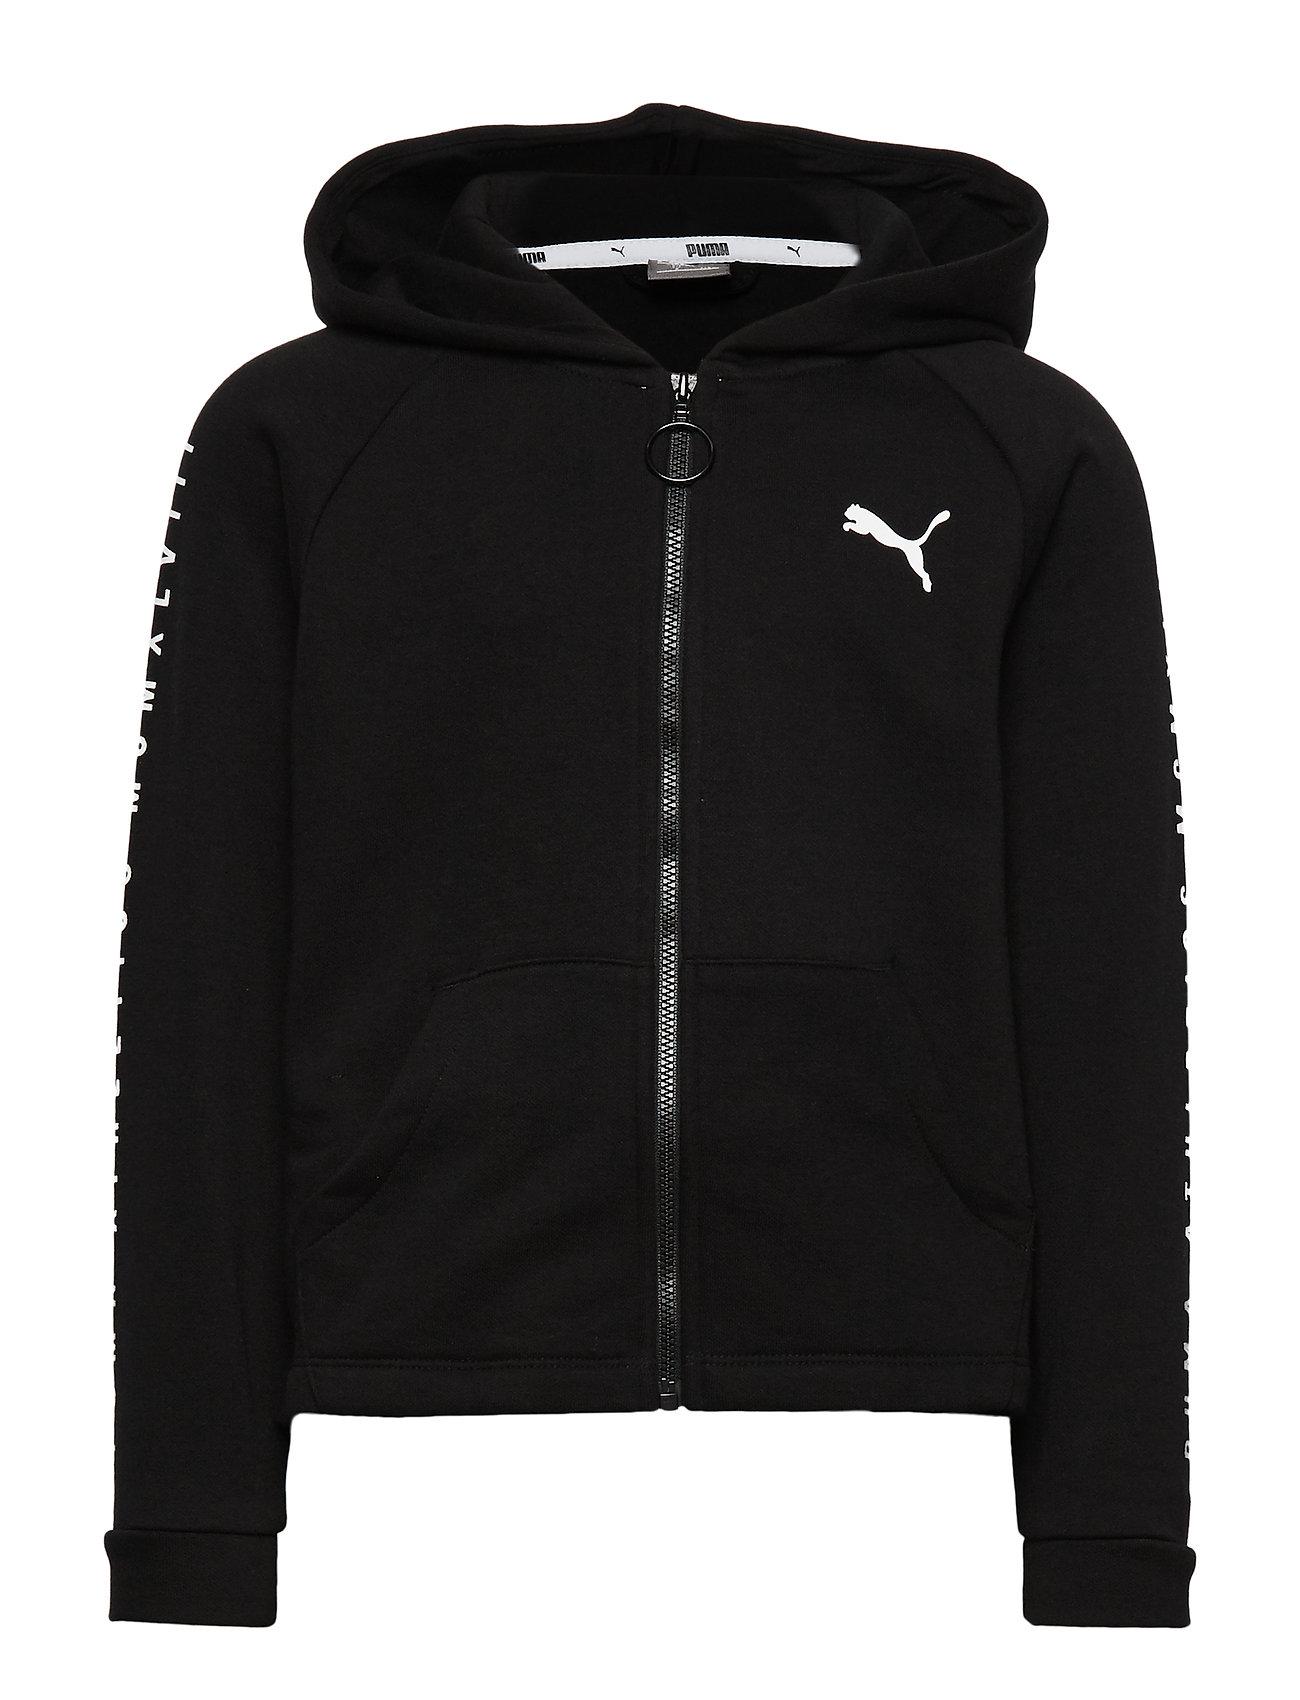 PUMA Alpha Jacket G - PUMA BLACK